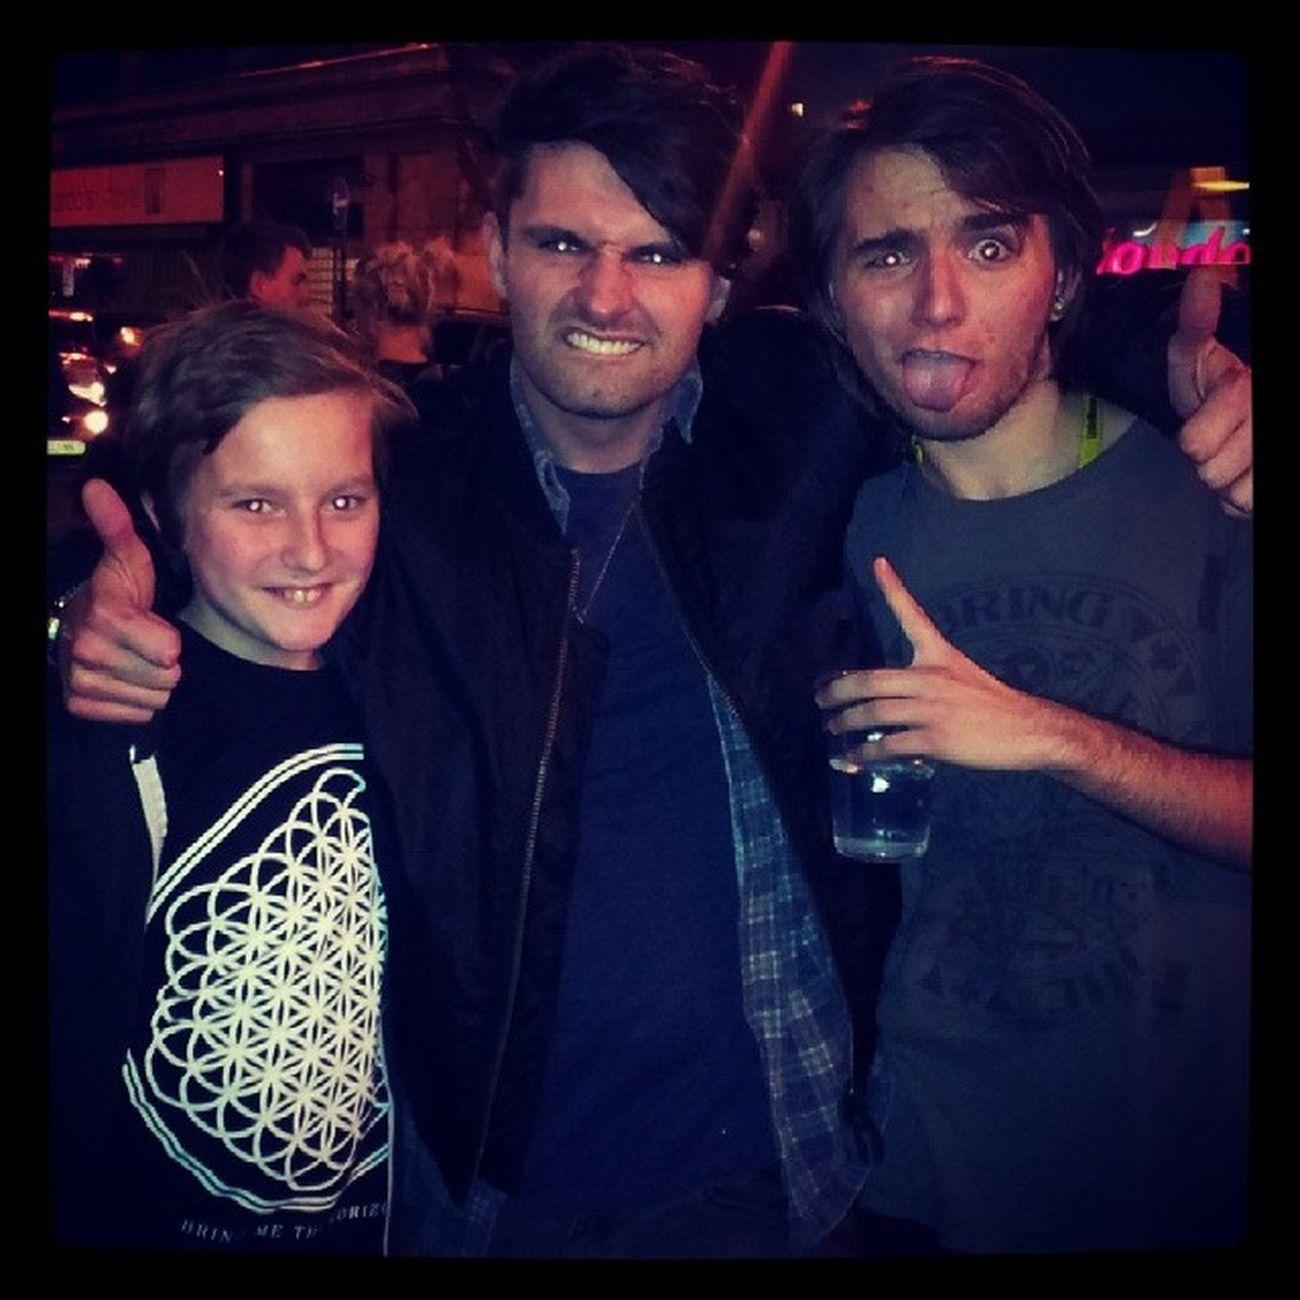 @grantburfoot look who i met!!! Mike Lowerthanatlantis Postgighair Bmth london brixton littlebro